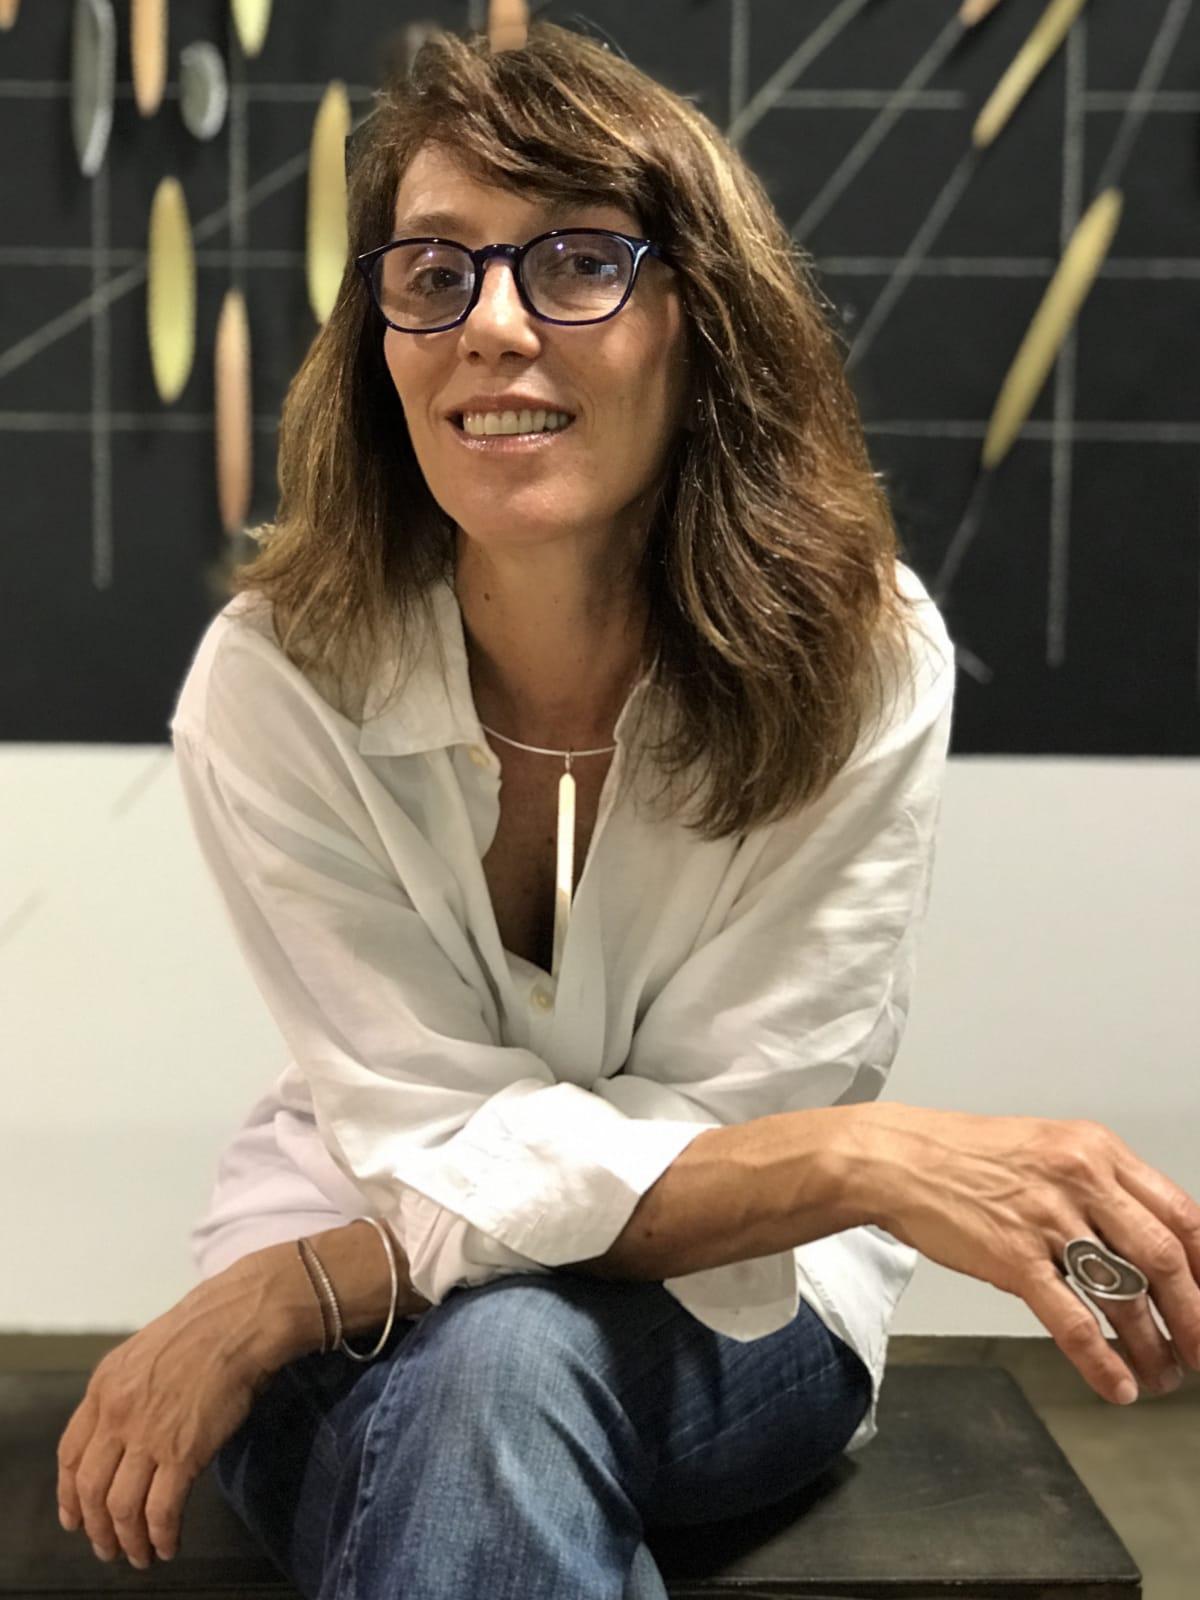 Artist of the Month: February, Carolina Sardi